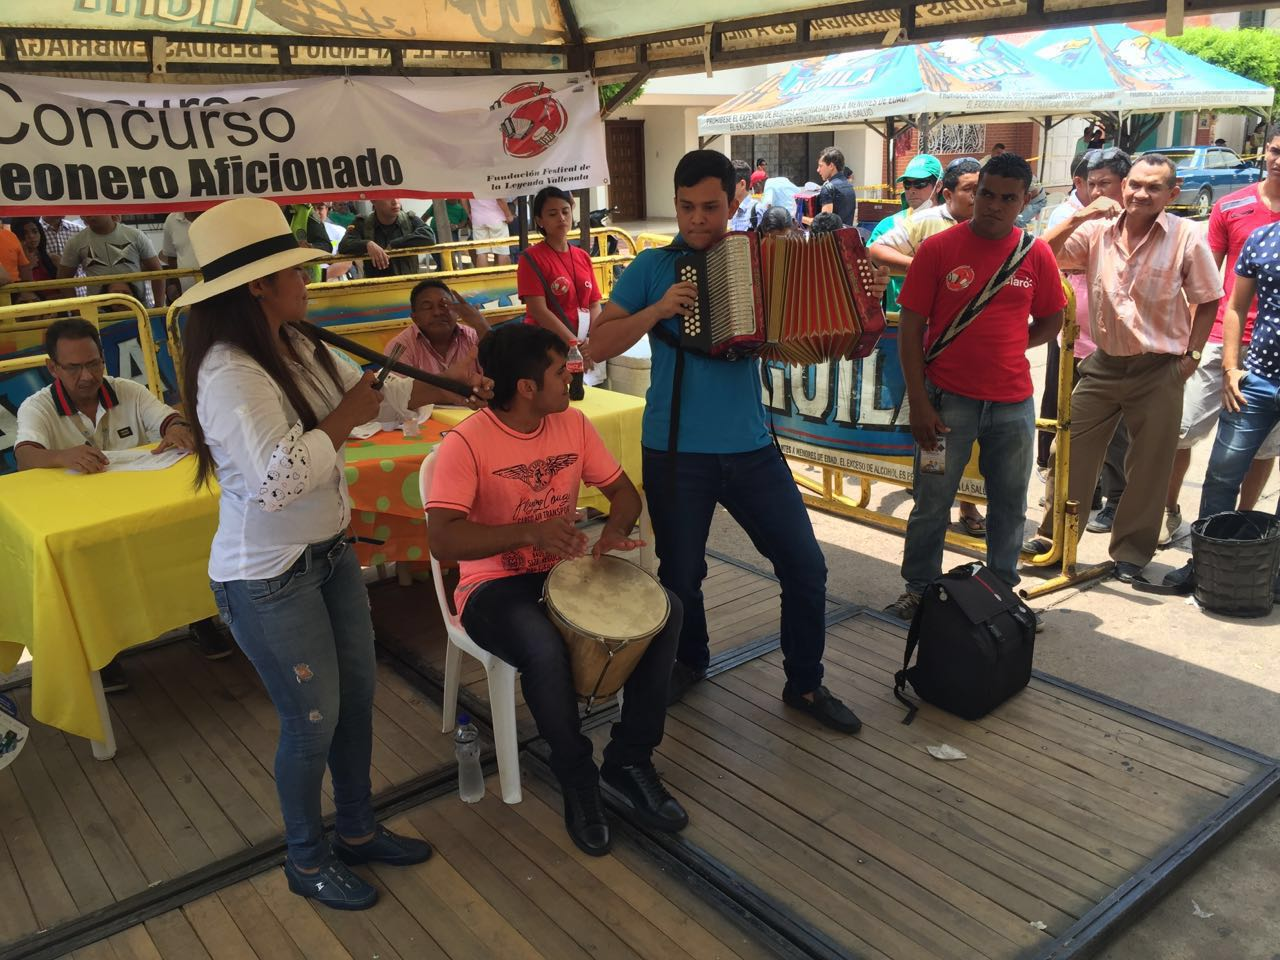 Polémica por beso entre Poncho Zuleta y Silvestre Dangond